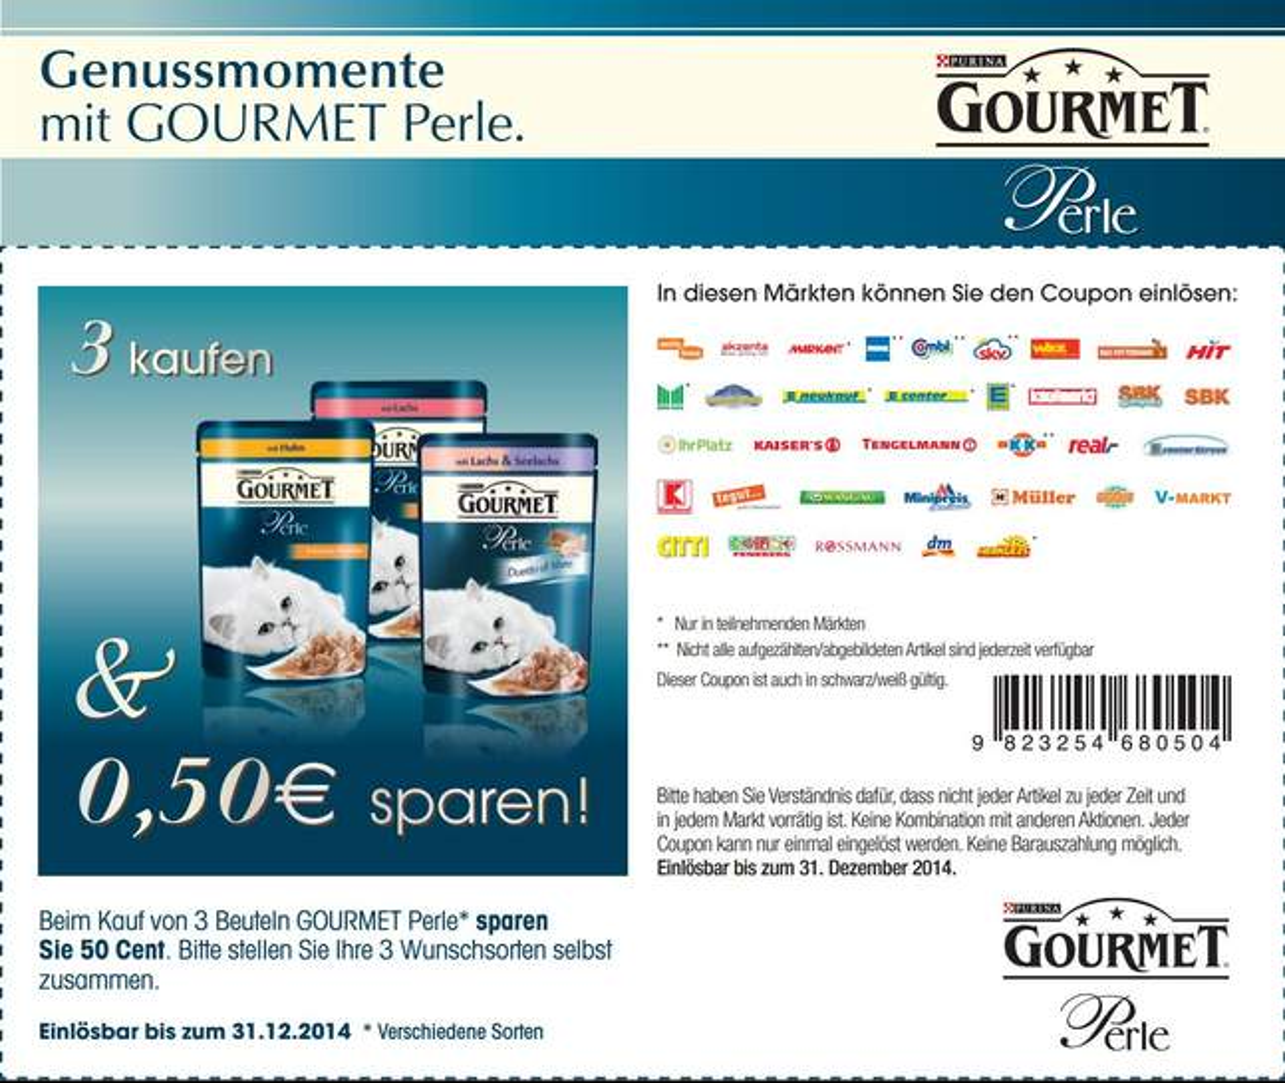 Supermarkt coupons